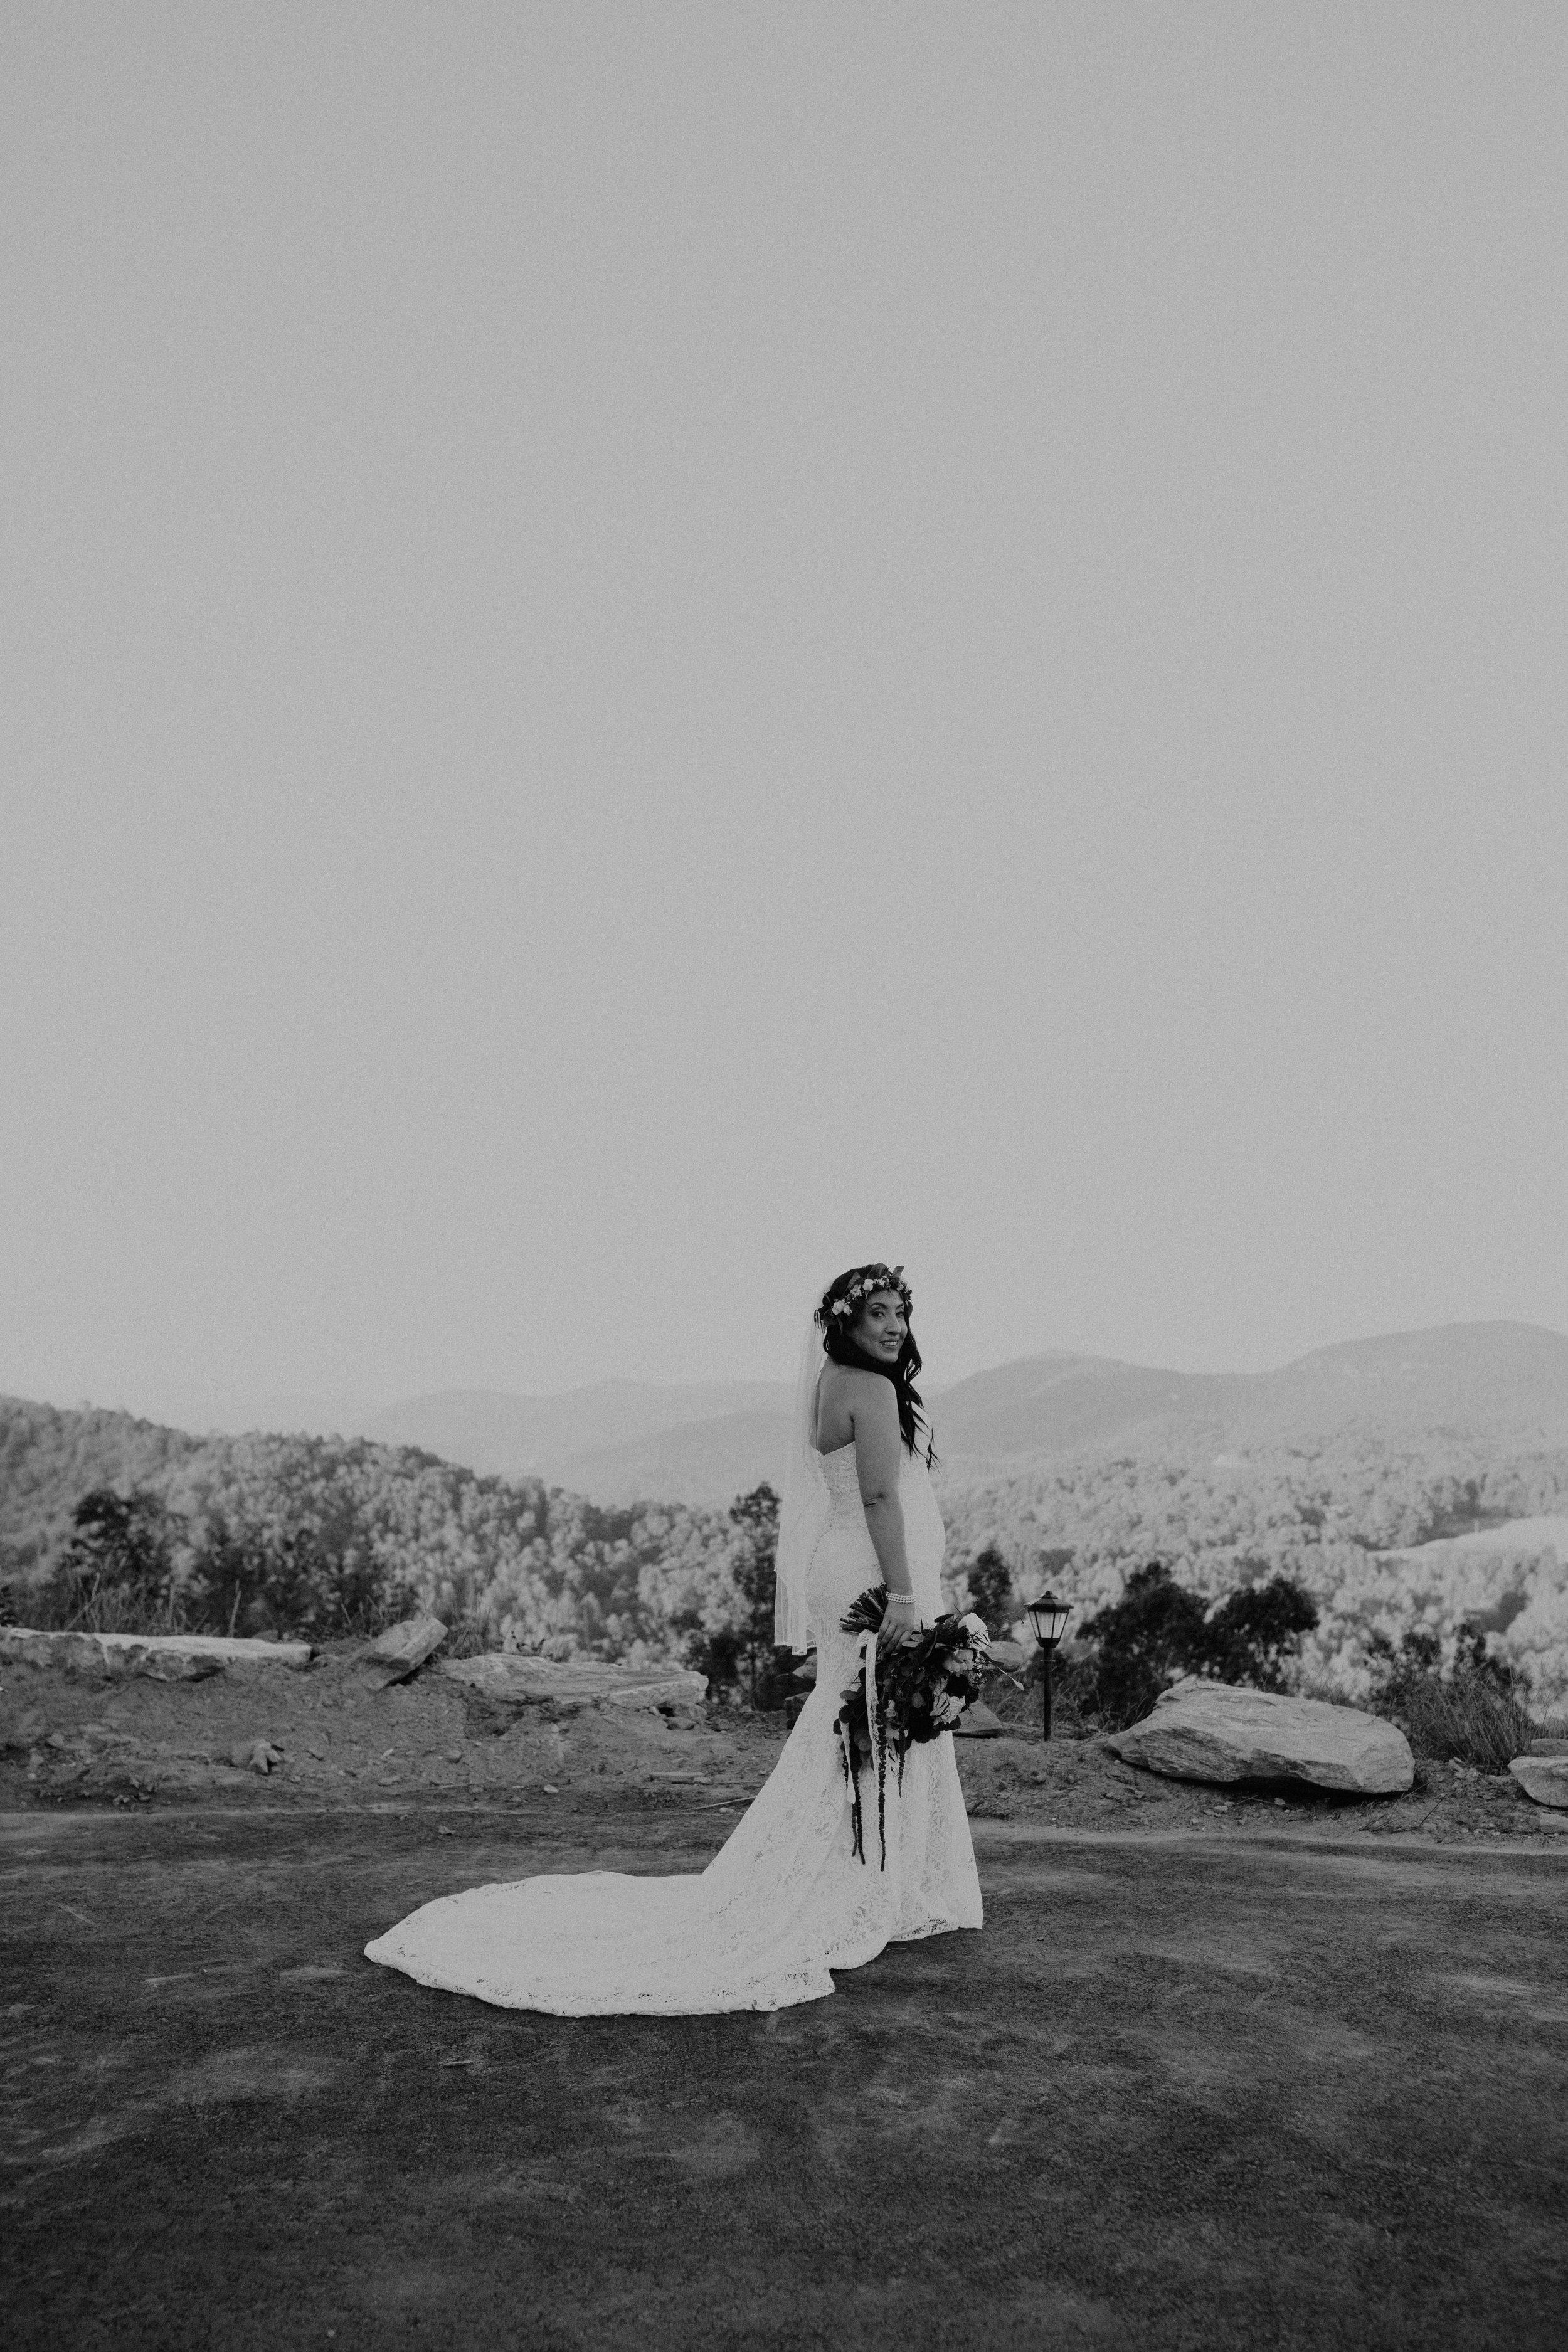 Point Lookout Vineyards Hendersonville North Carolina -Wedding-Renee and Jason-62.JPG